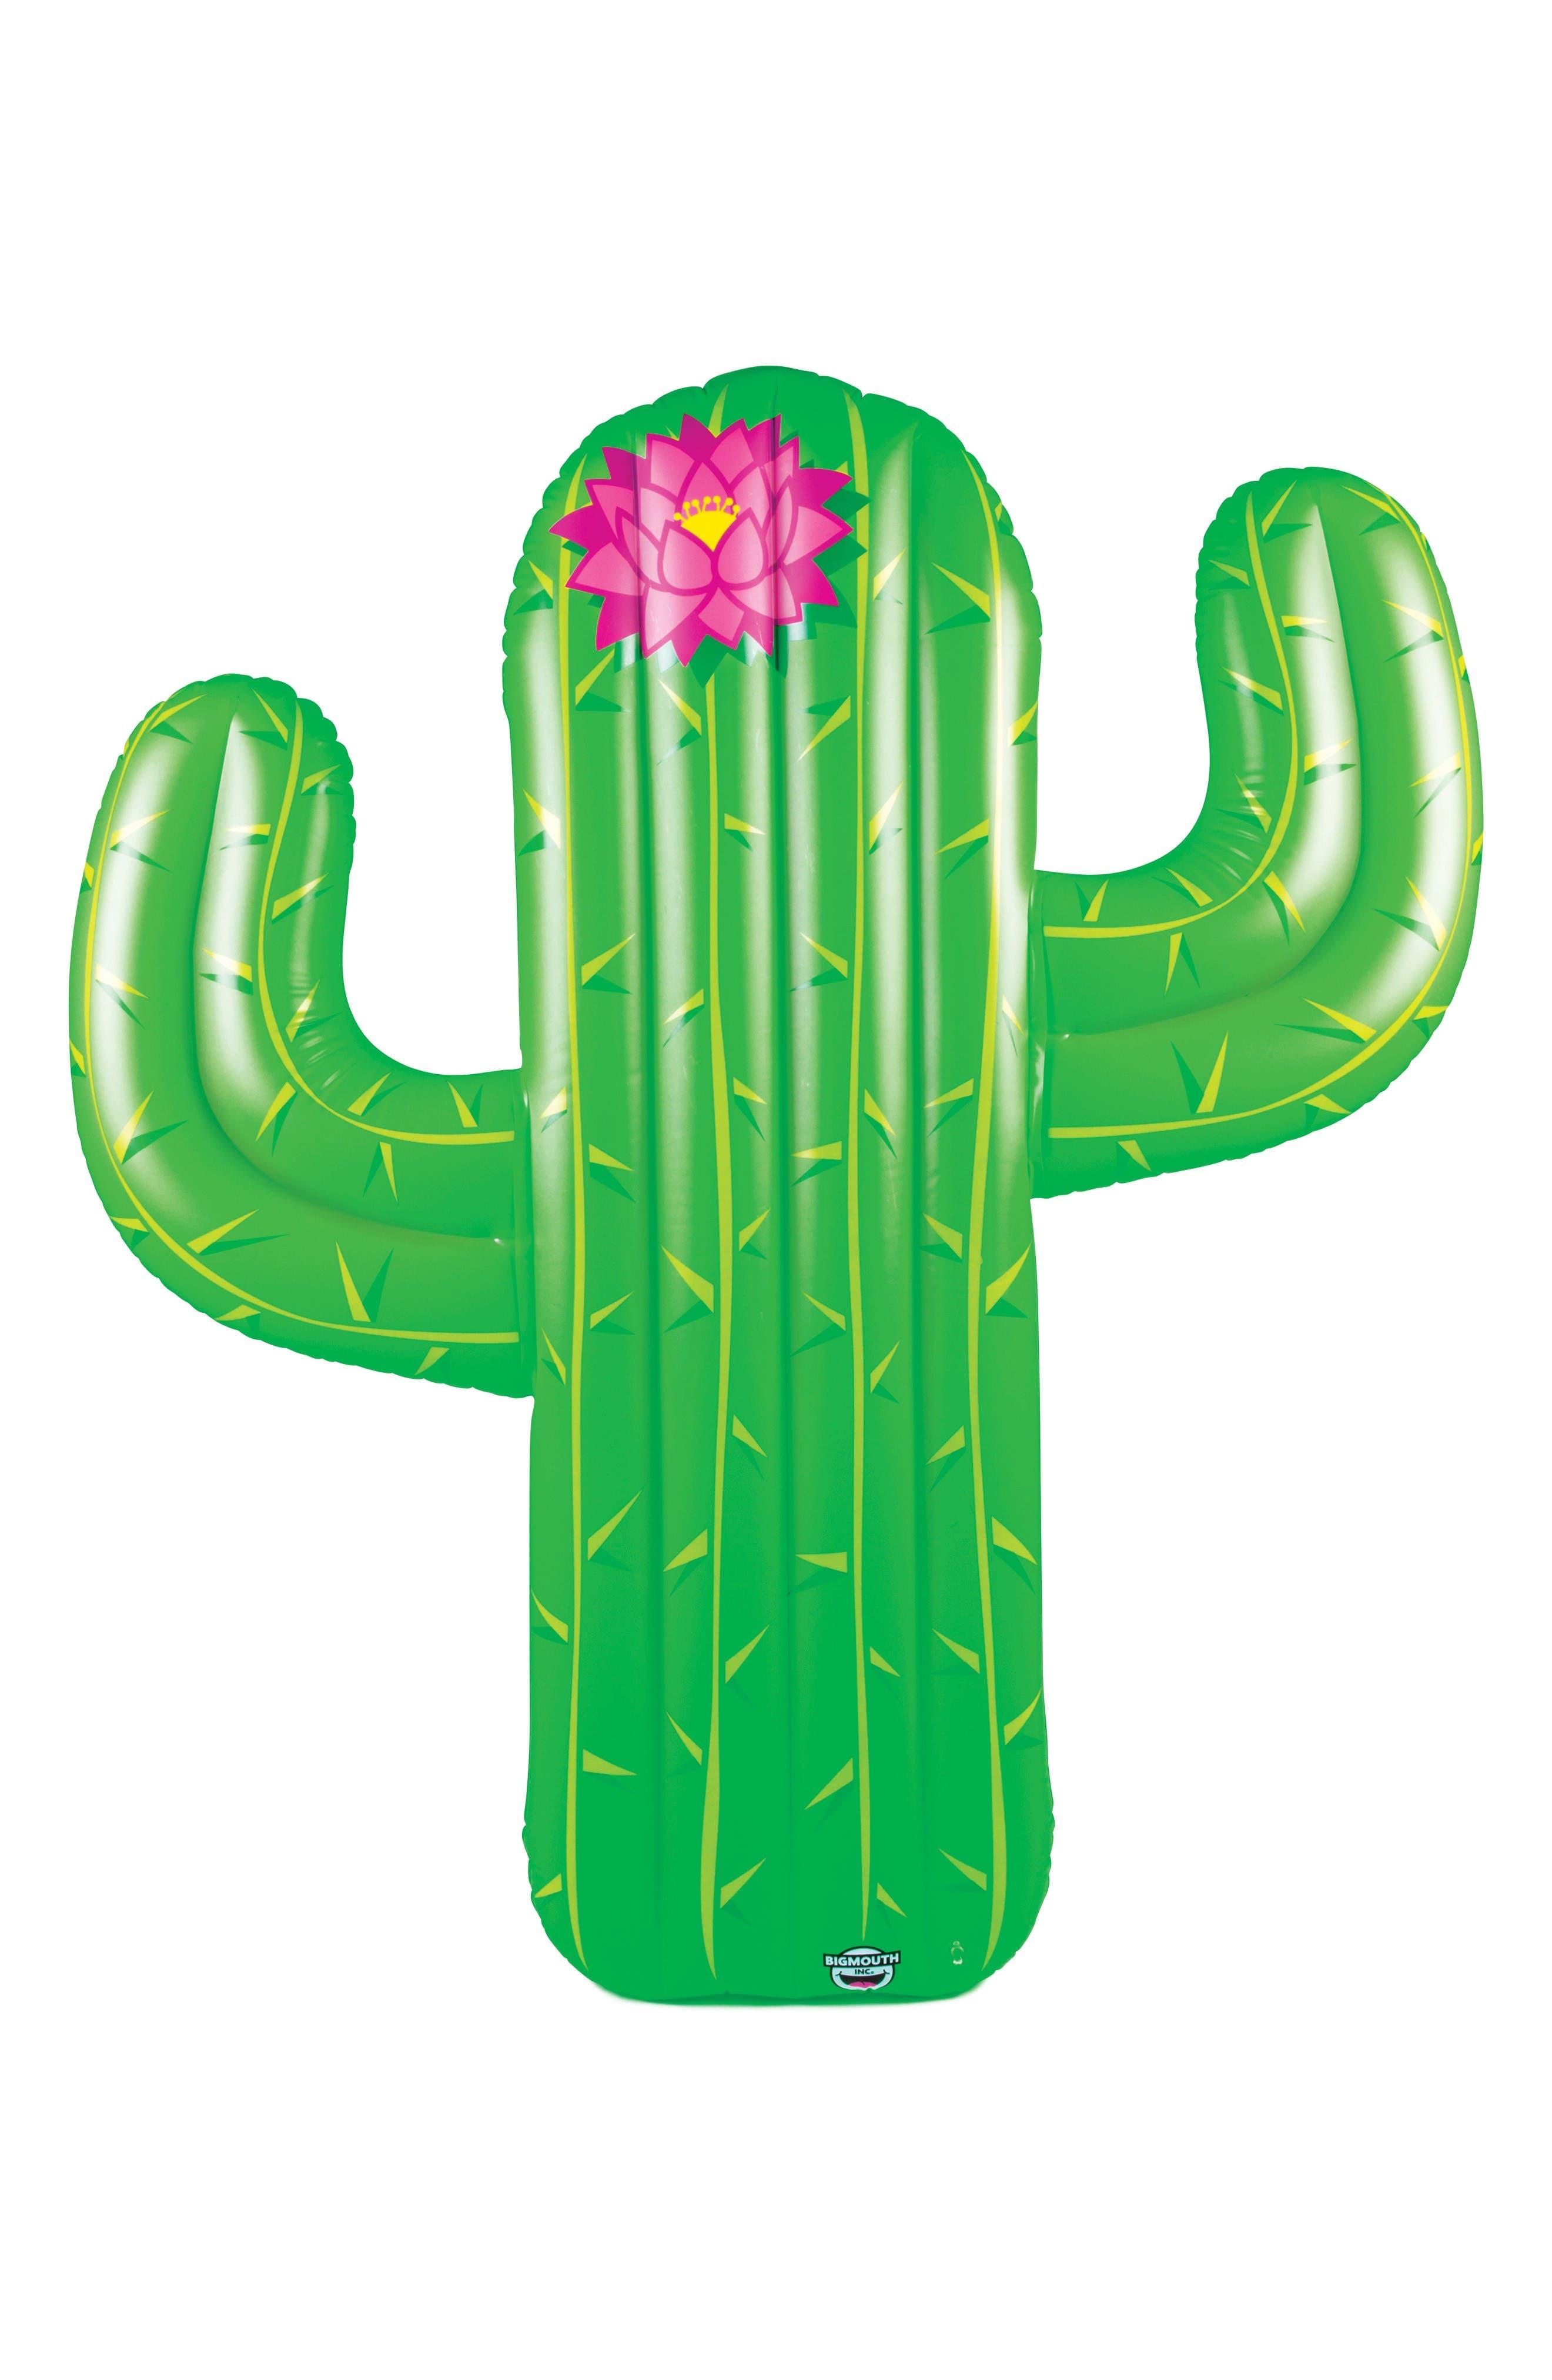 Main Image - BigMouth Inc. Cactus Pool Float